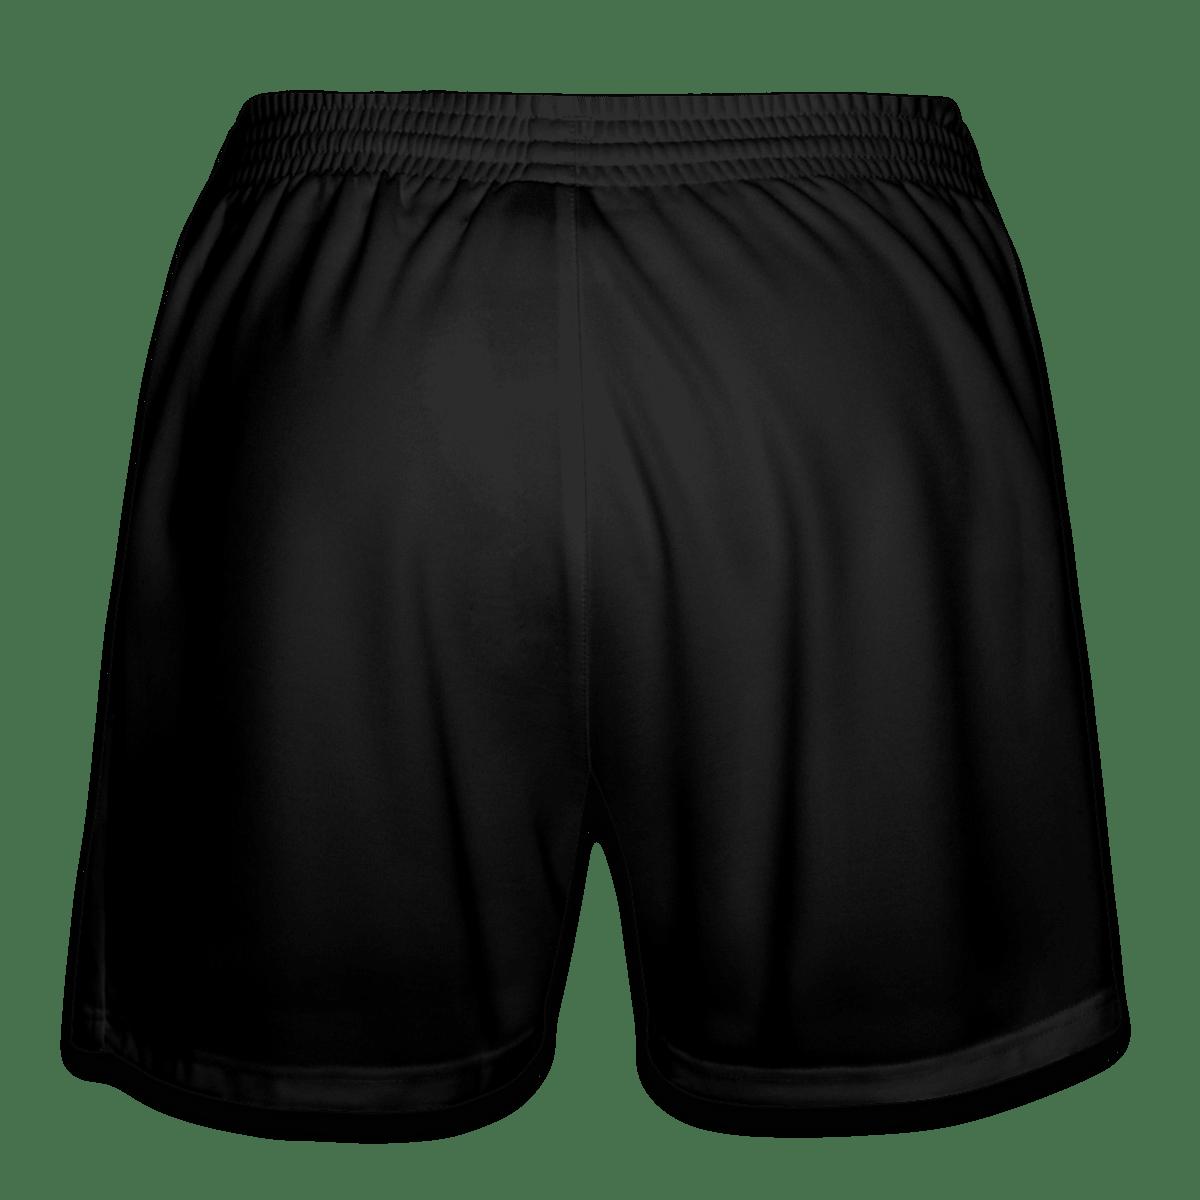 3b13349409c ERIMA Celta shorts | TeamShirts